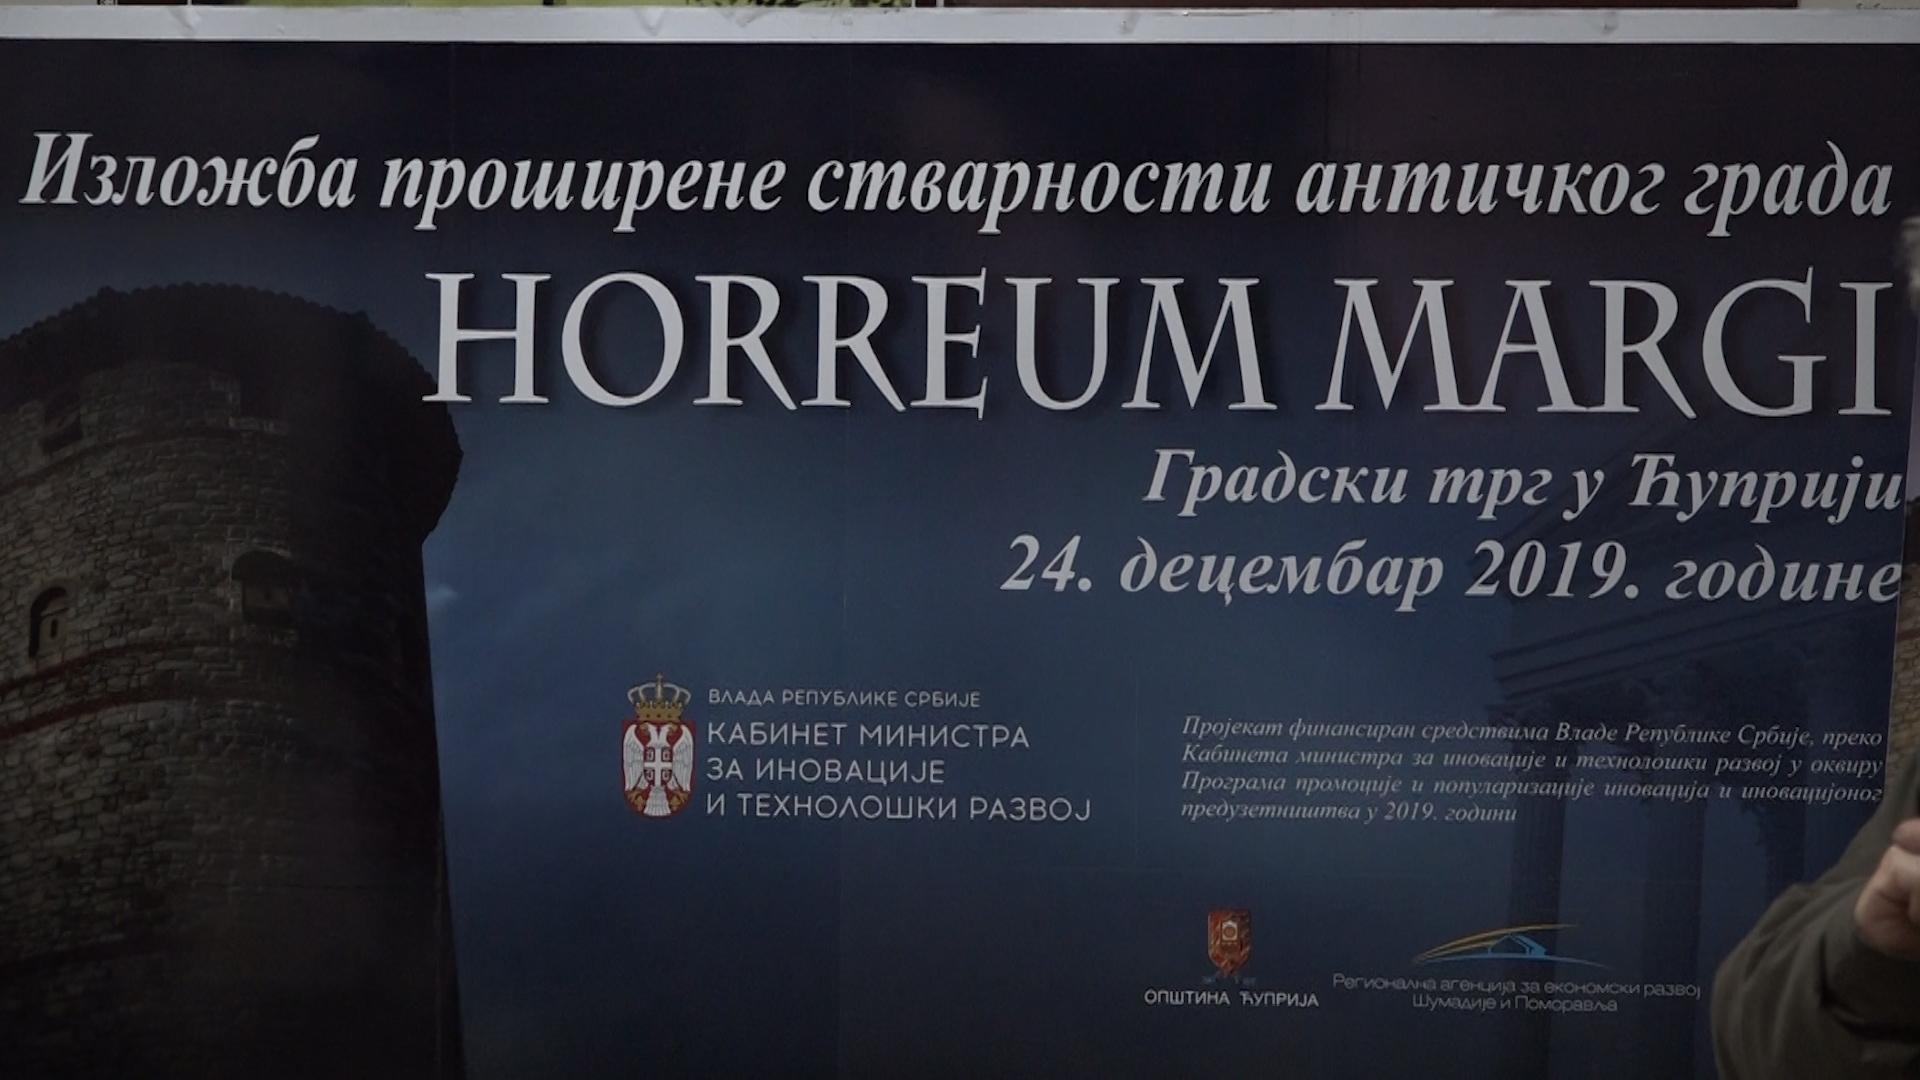 Izložba proširene stvarnosti antičkog grada Horreum Margi